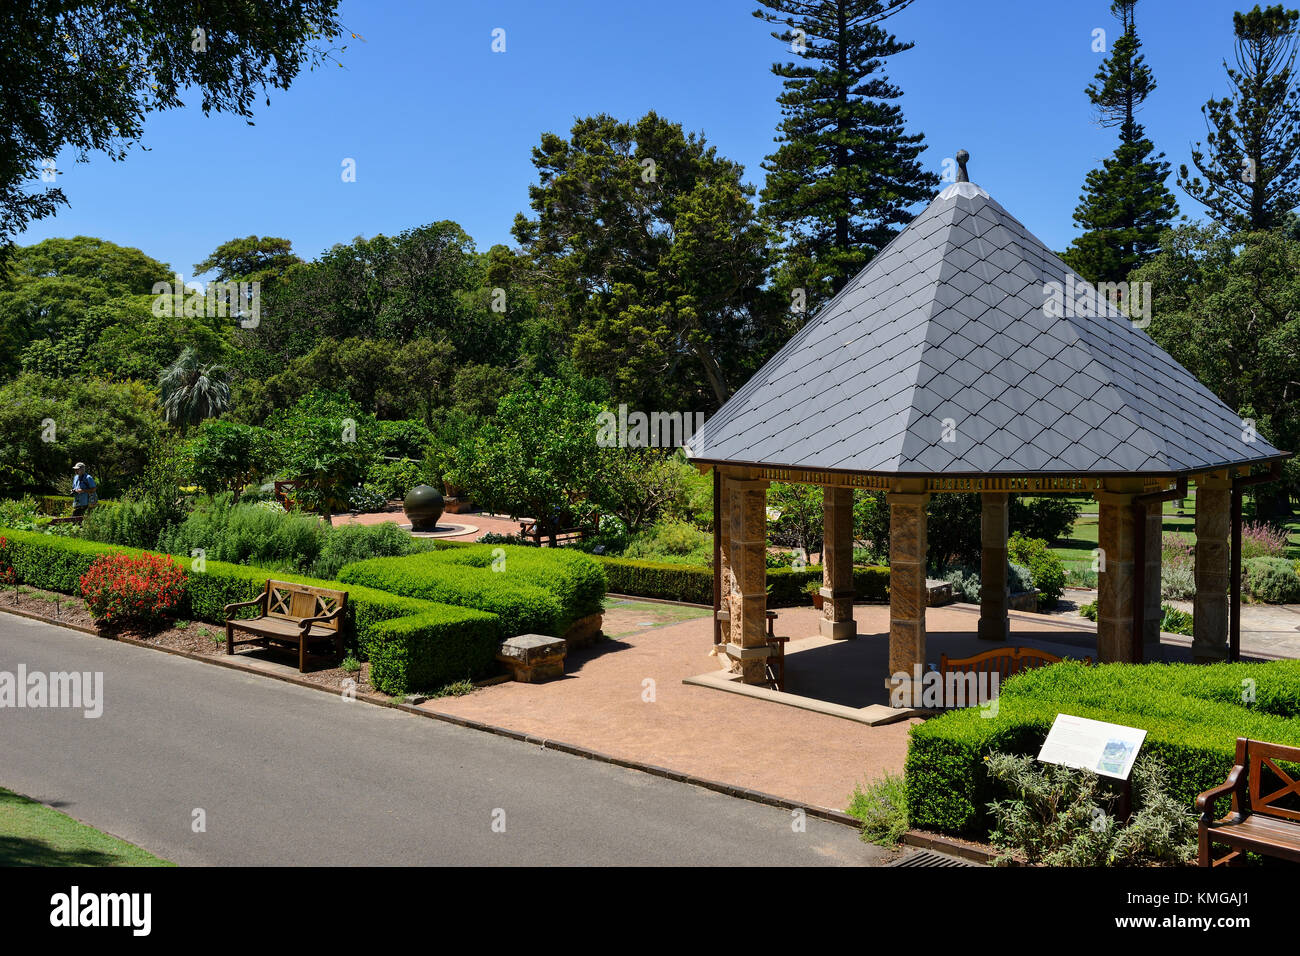 Pavilion australia stockfotos pavilion australia bilder - Botanischer garten shanghai ...